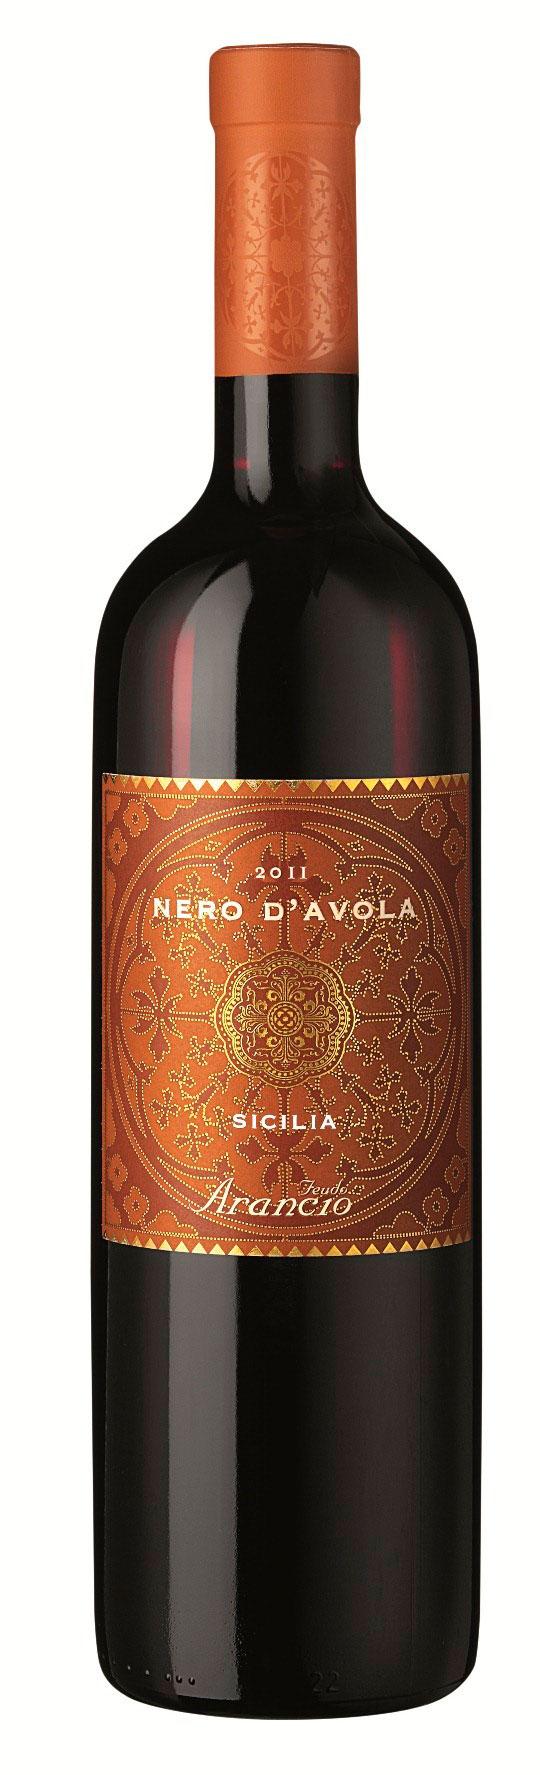 Feudo Arancio Nero d'Avola Sicilia 2019